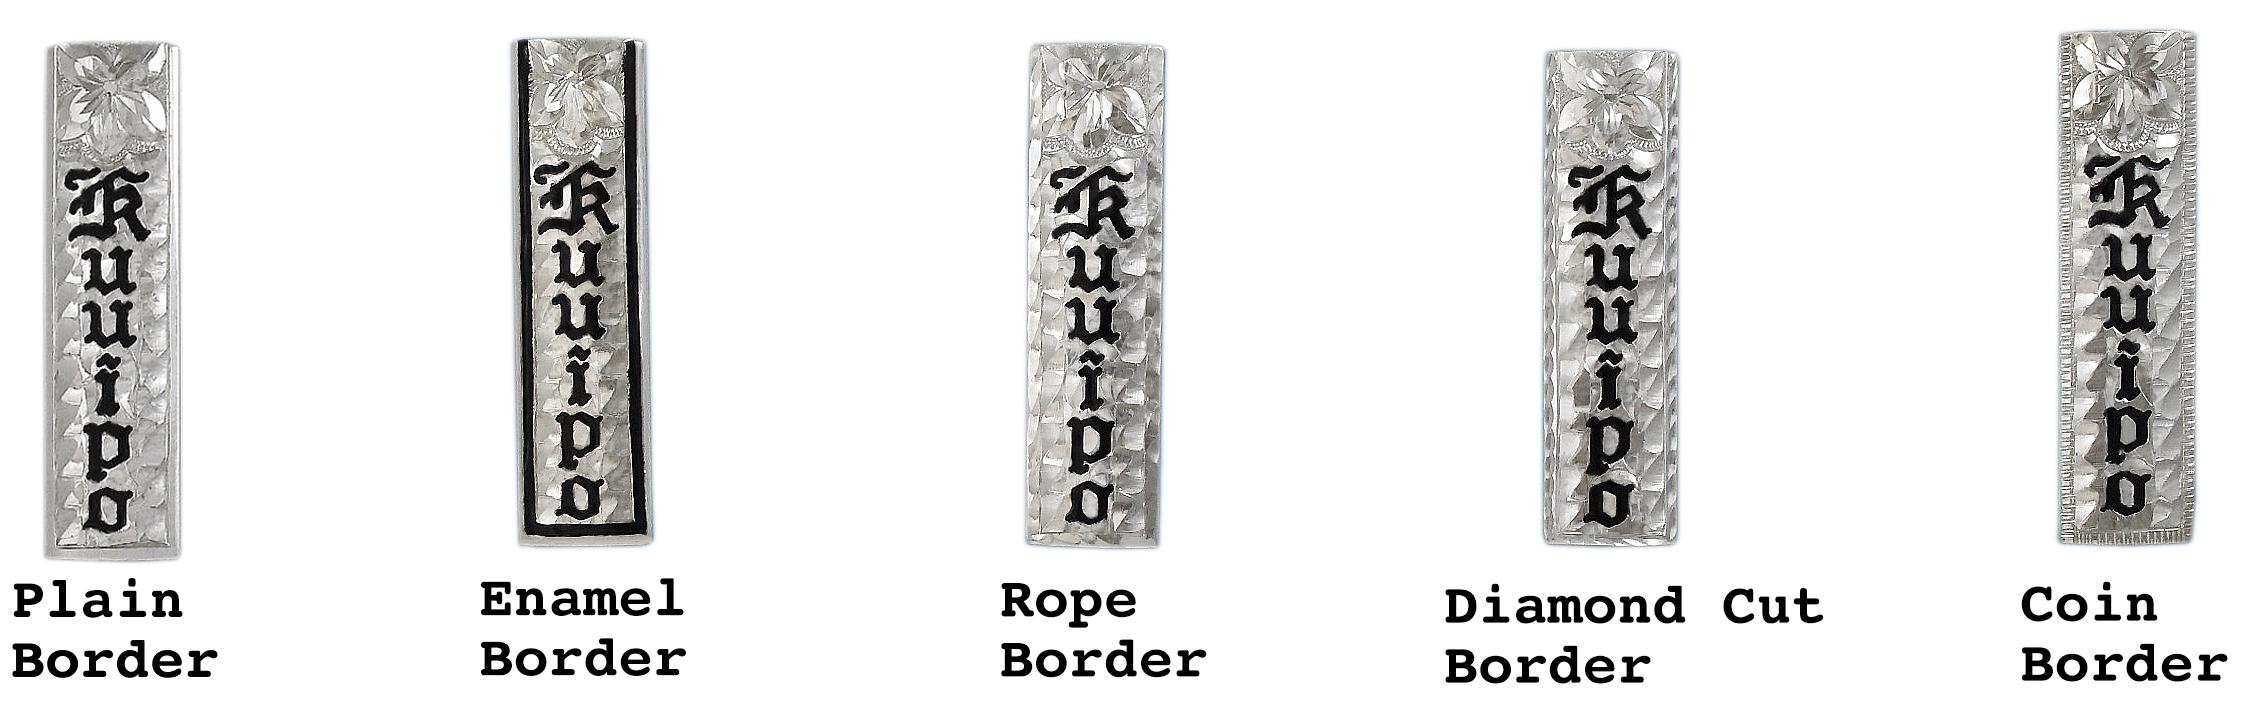 type-of-border5.jpg